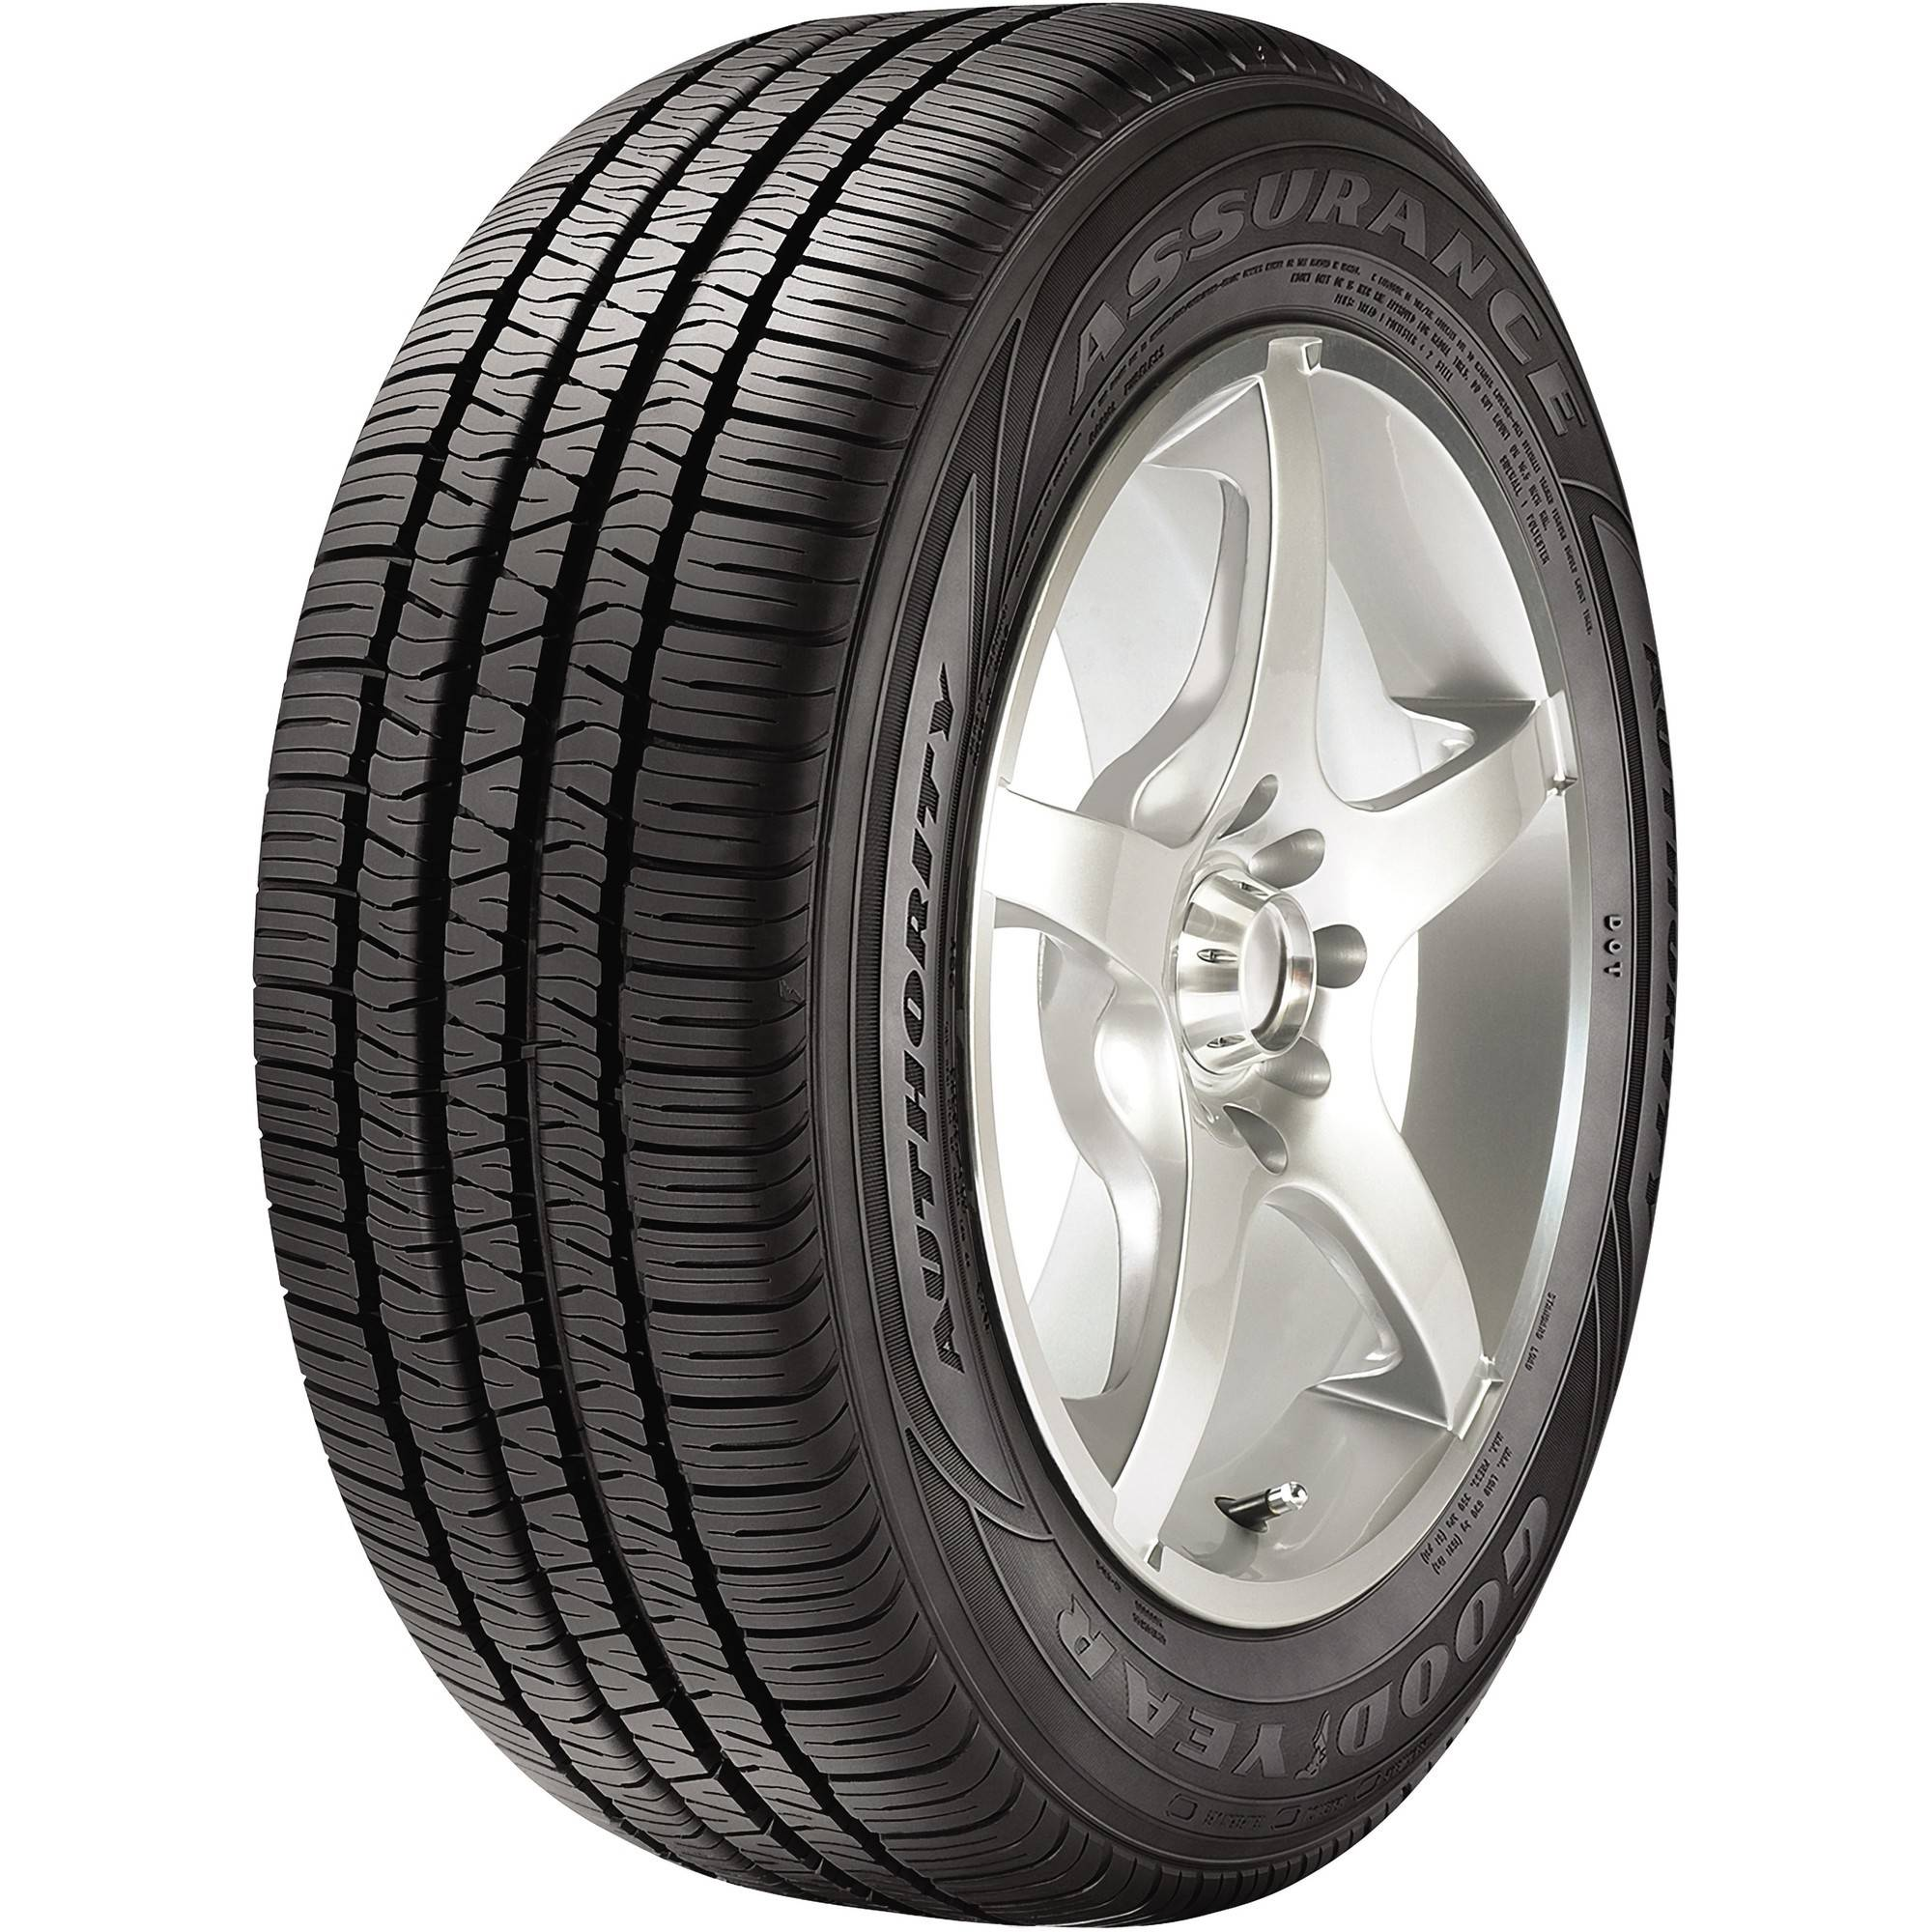 goodyear assurance tripletred all season tire 215 55r17 sl 94v vsb. Black Bedroom Furniture Sets. Home Design Ideas